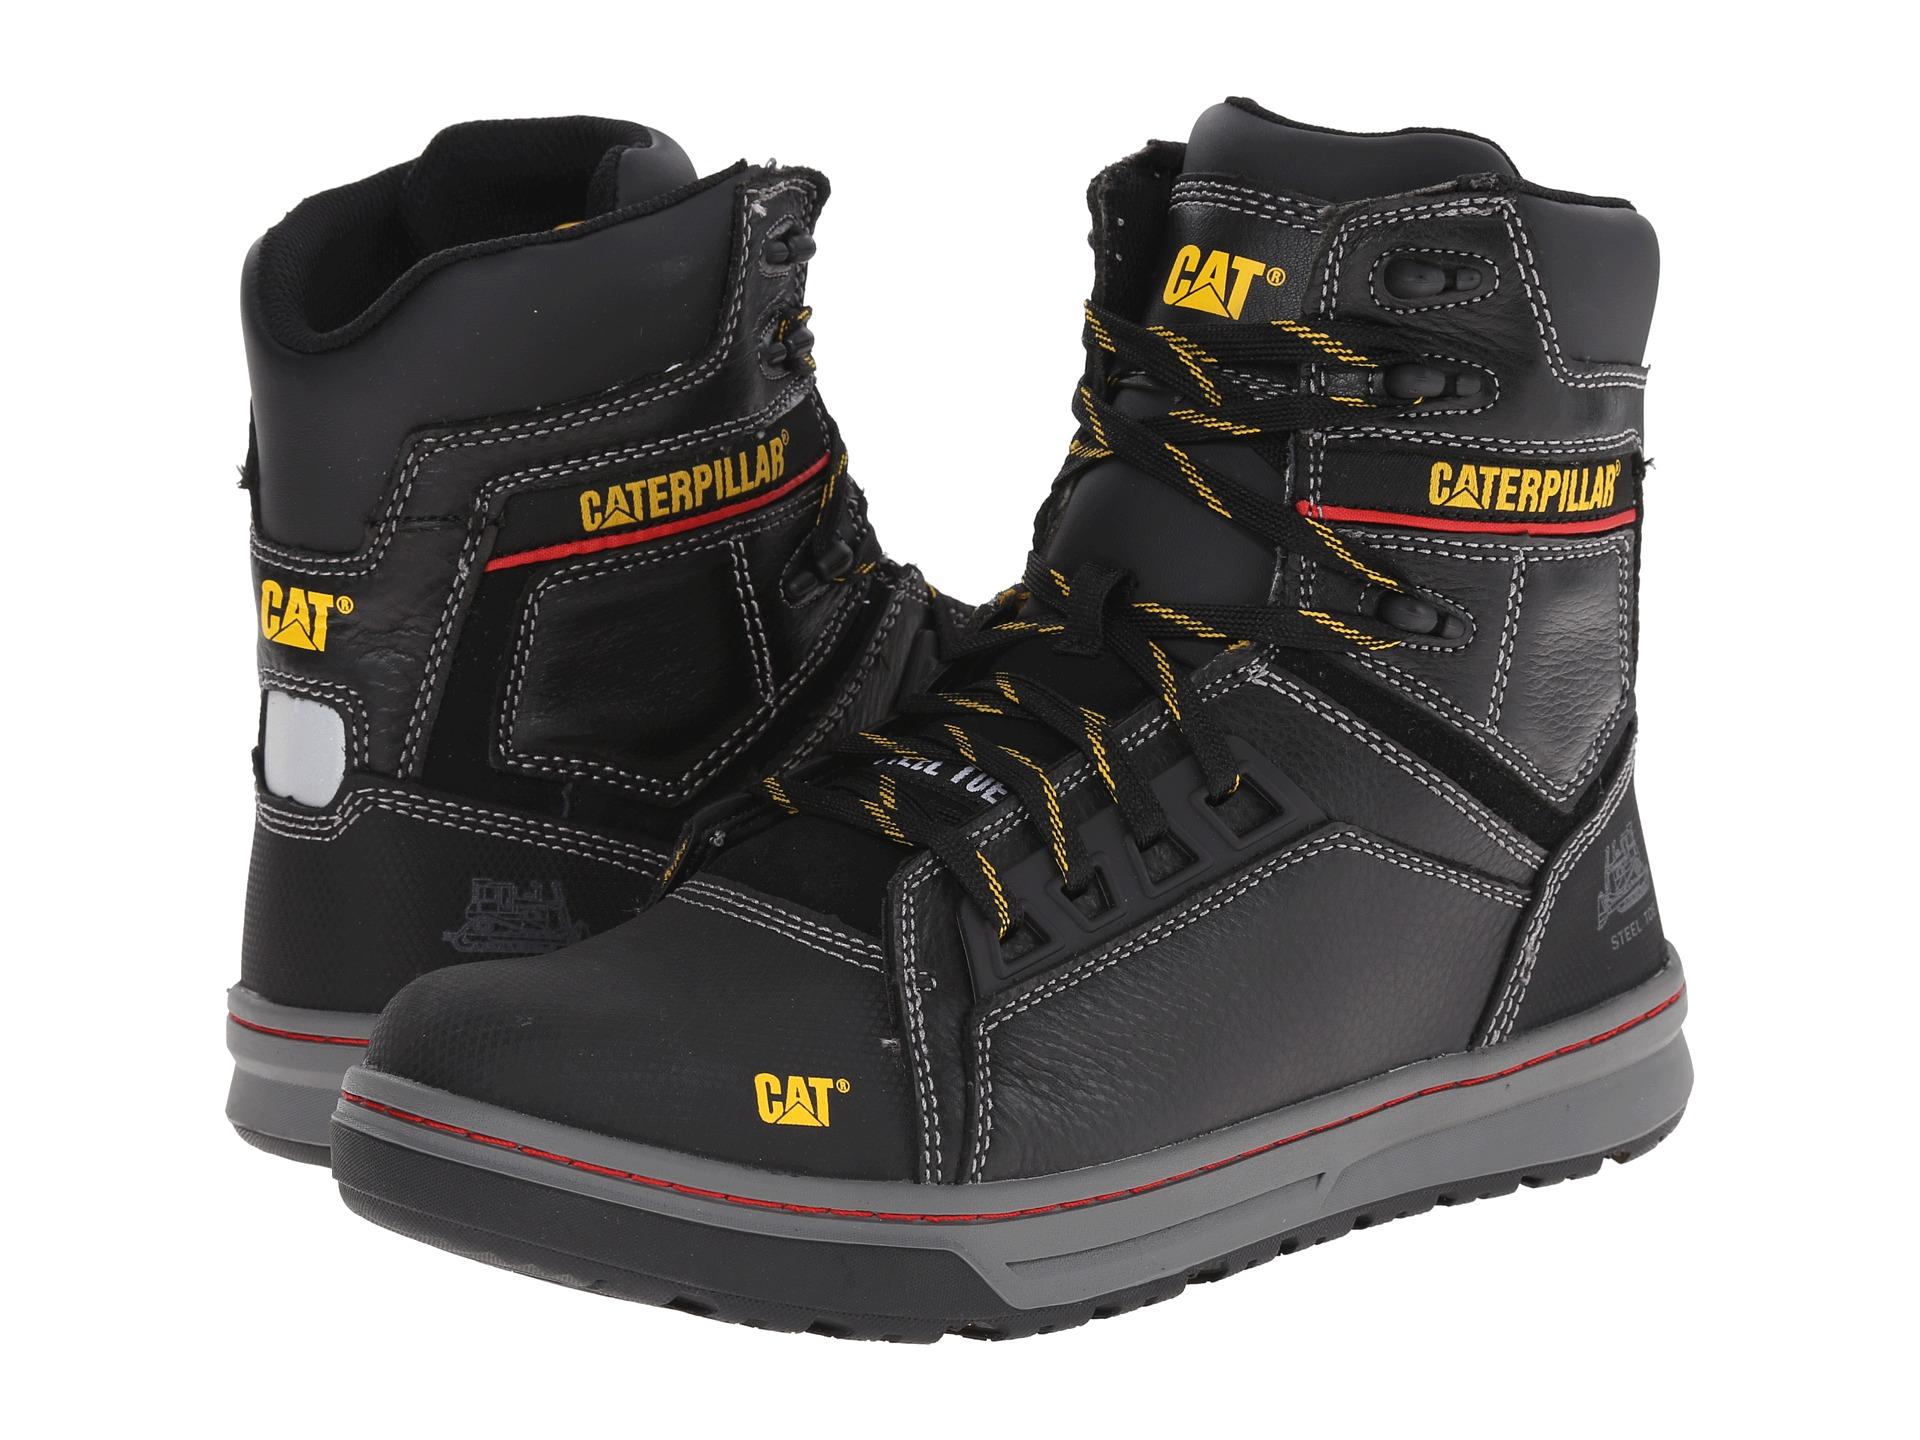 Steel Toe Boots Excellent Condition 50 Edmonton In